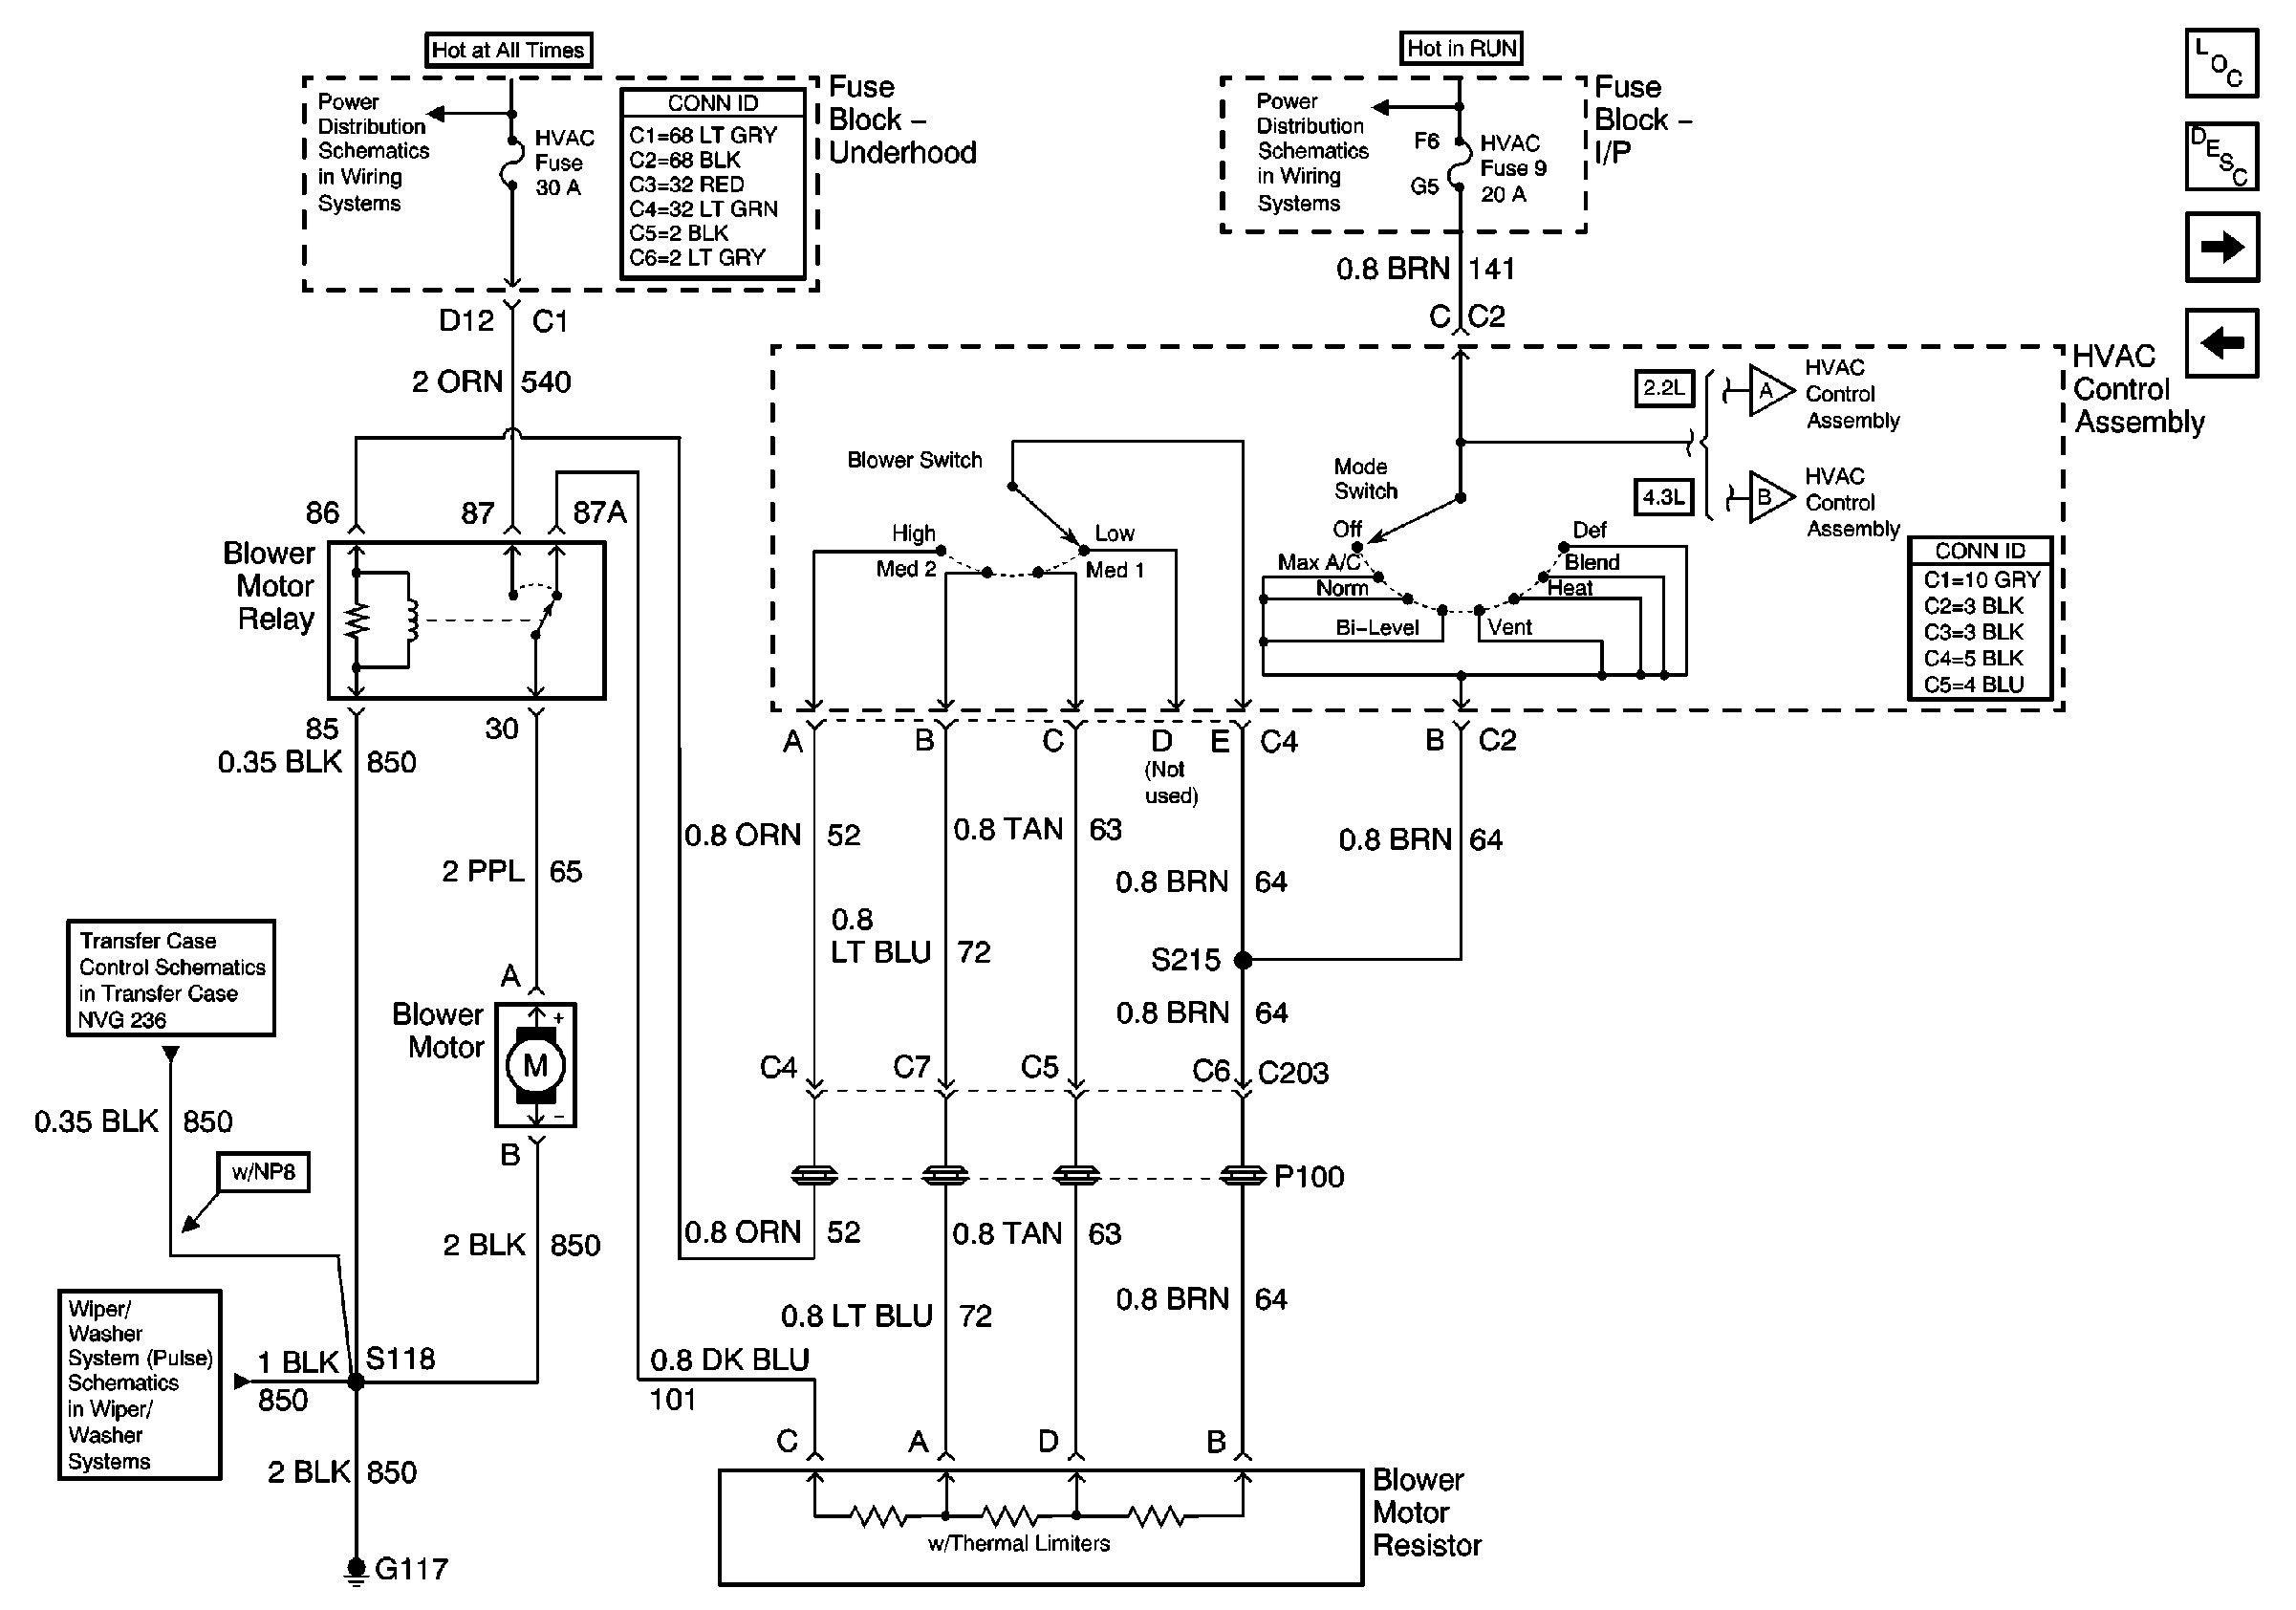 94 S10 Blower Motor Wiring Diagram Residential Electrical Symbols Wiring Diagram Diagram Electrical Diagram